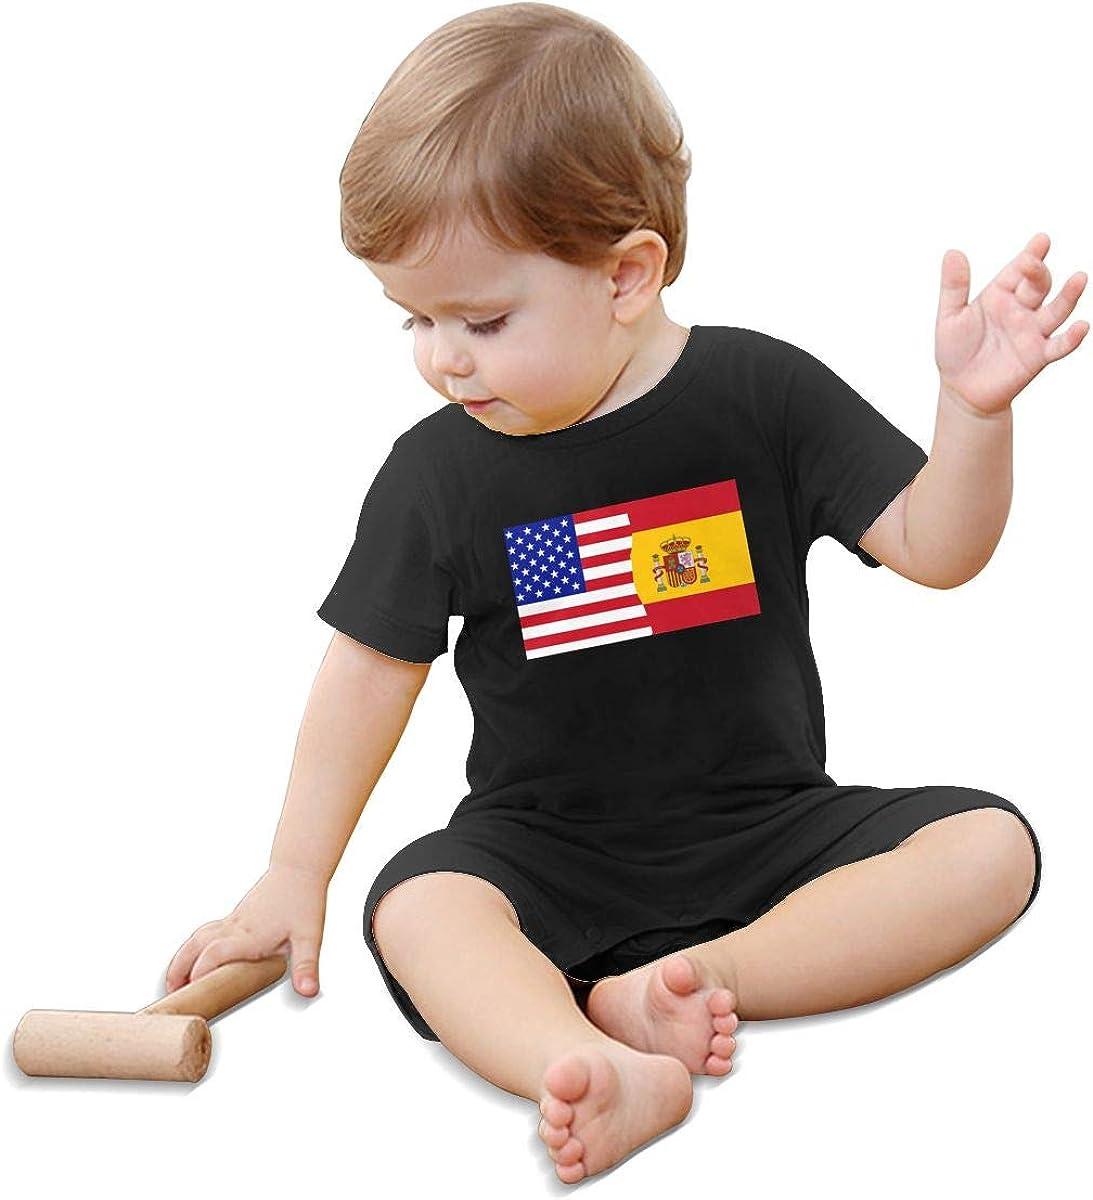 Mri-le1 Baby Boy Jumpsuit Half USA Half Spain Flag Baby Clothes